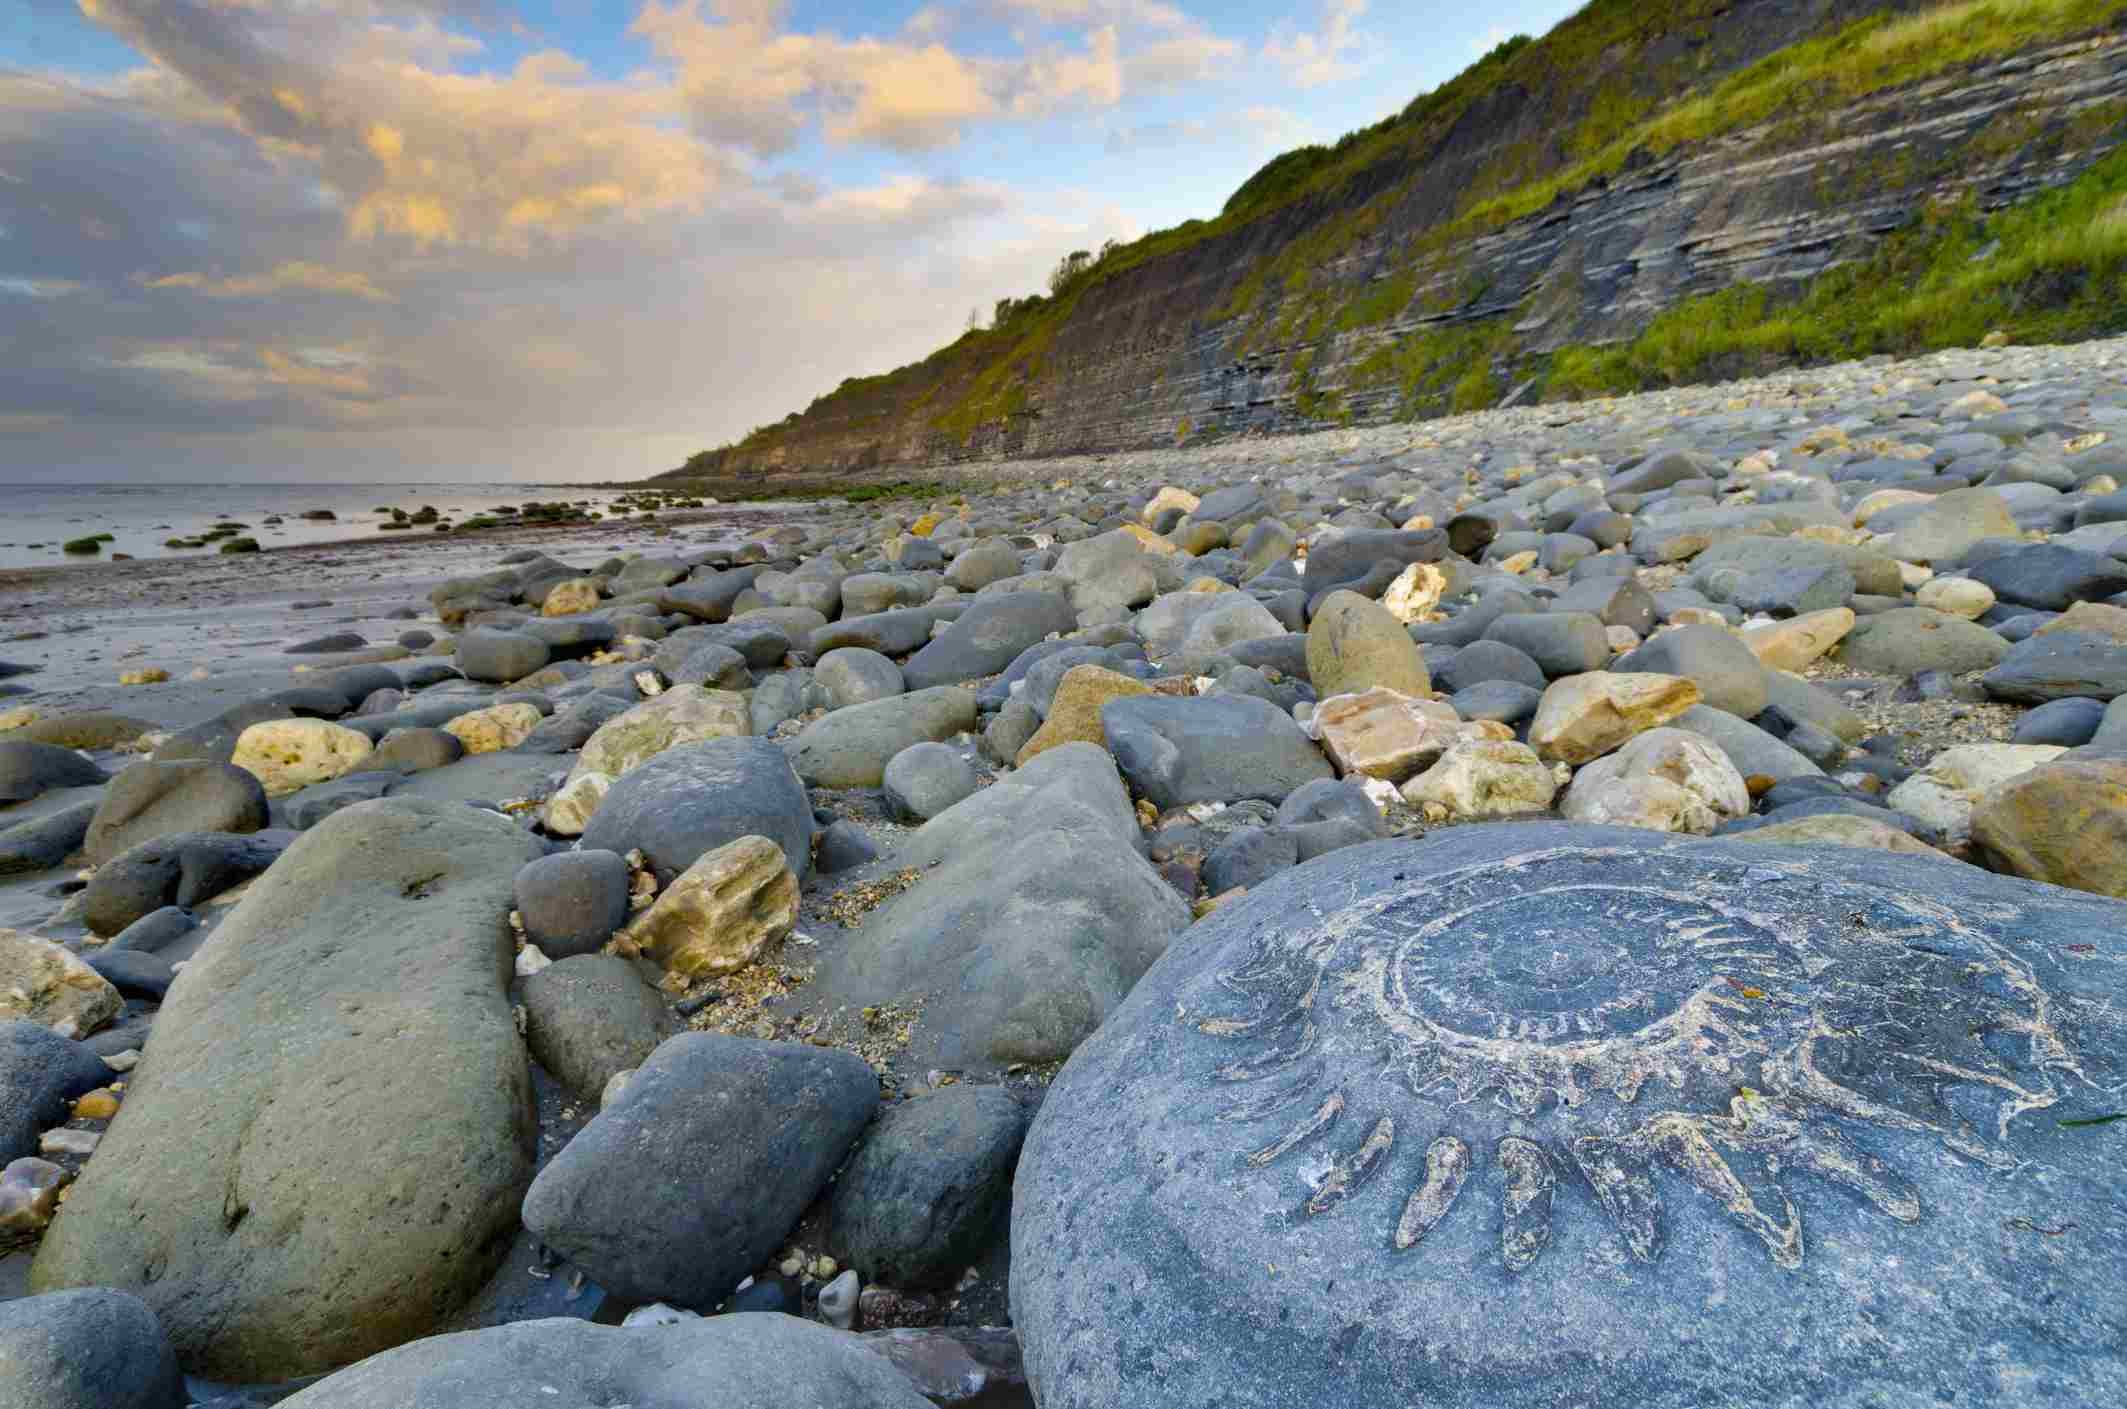 UK, England, Dorset, Lyme Regis, Monmouth Beach, Ammonite Pavement, Large ammonite fossil